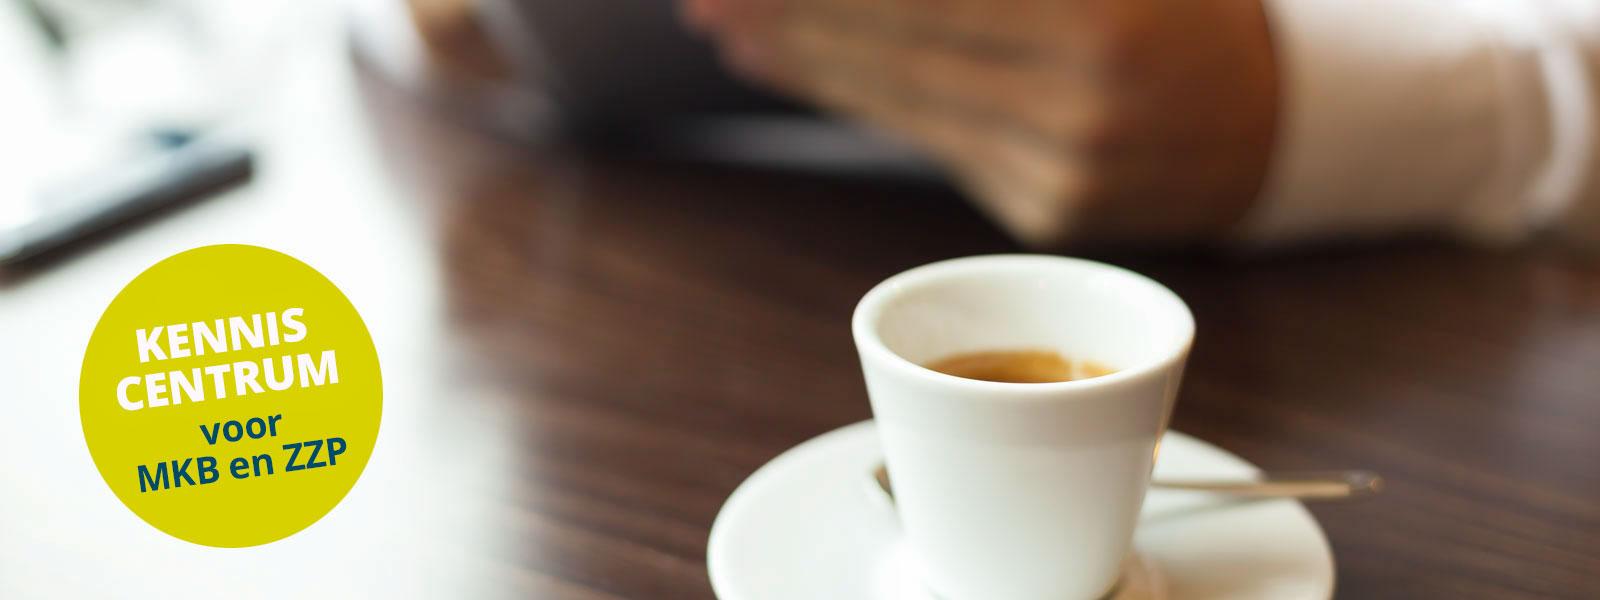 Kom langs voor koffie en een goed advies